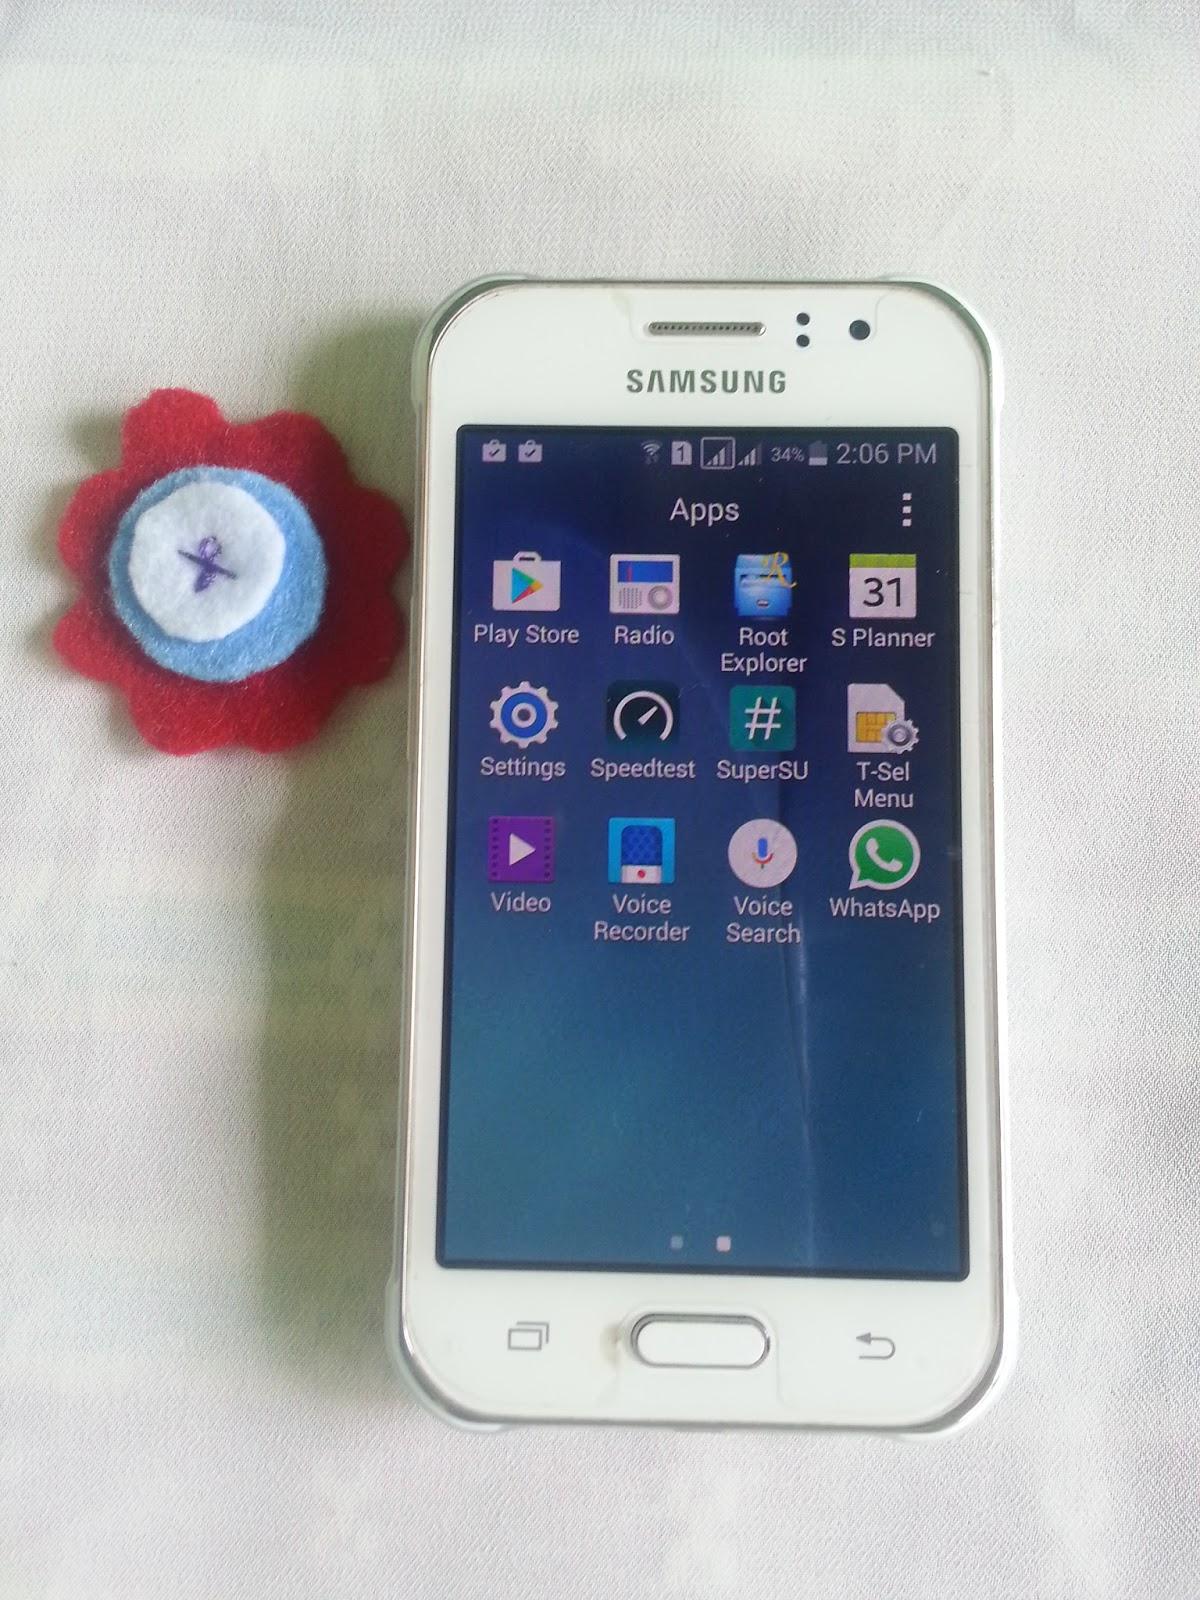 Rooting Samsung Galaxy J1 Ace (J110G)